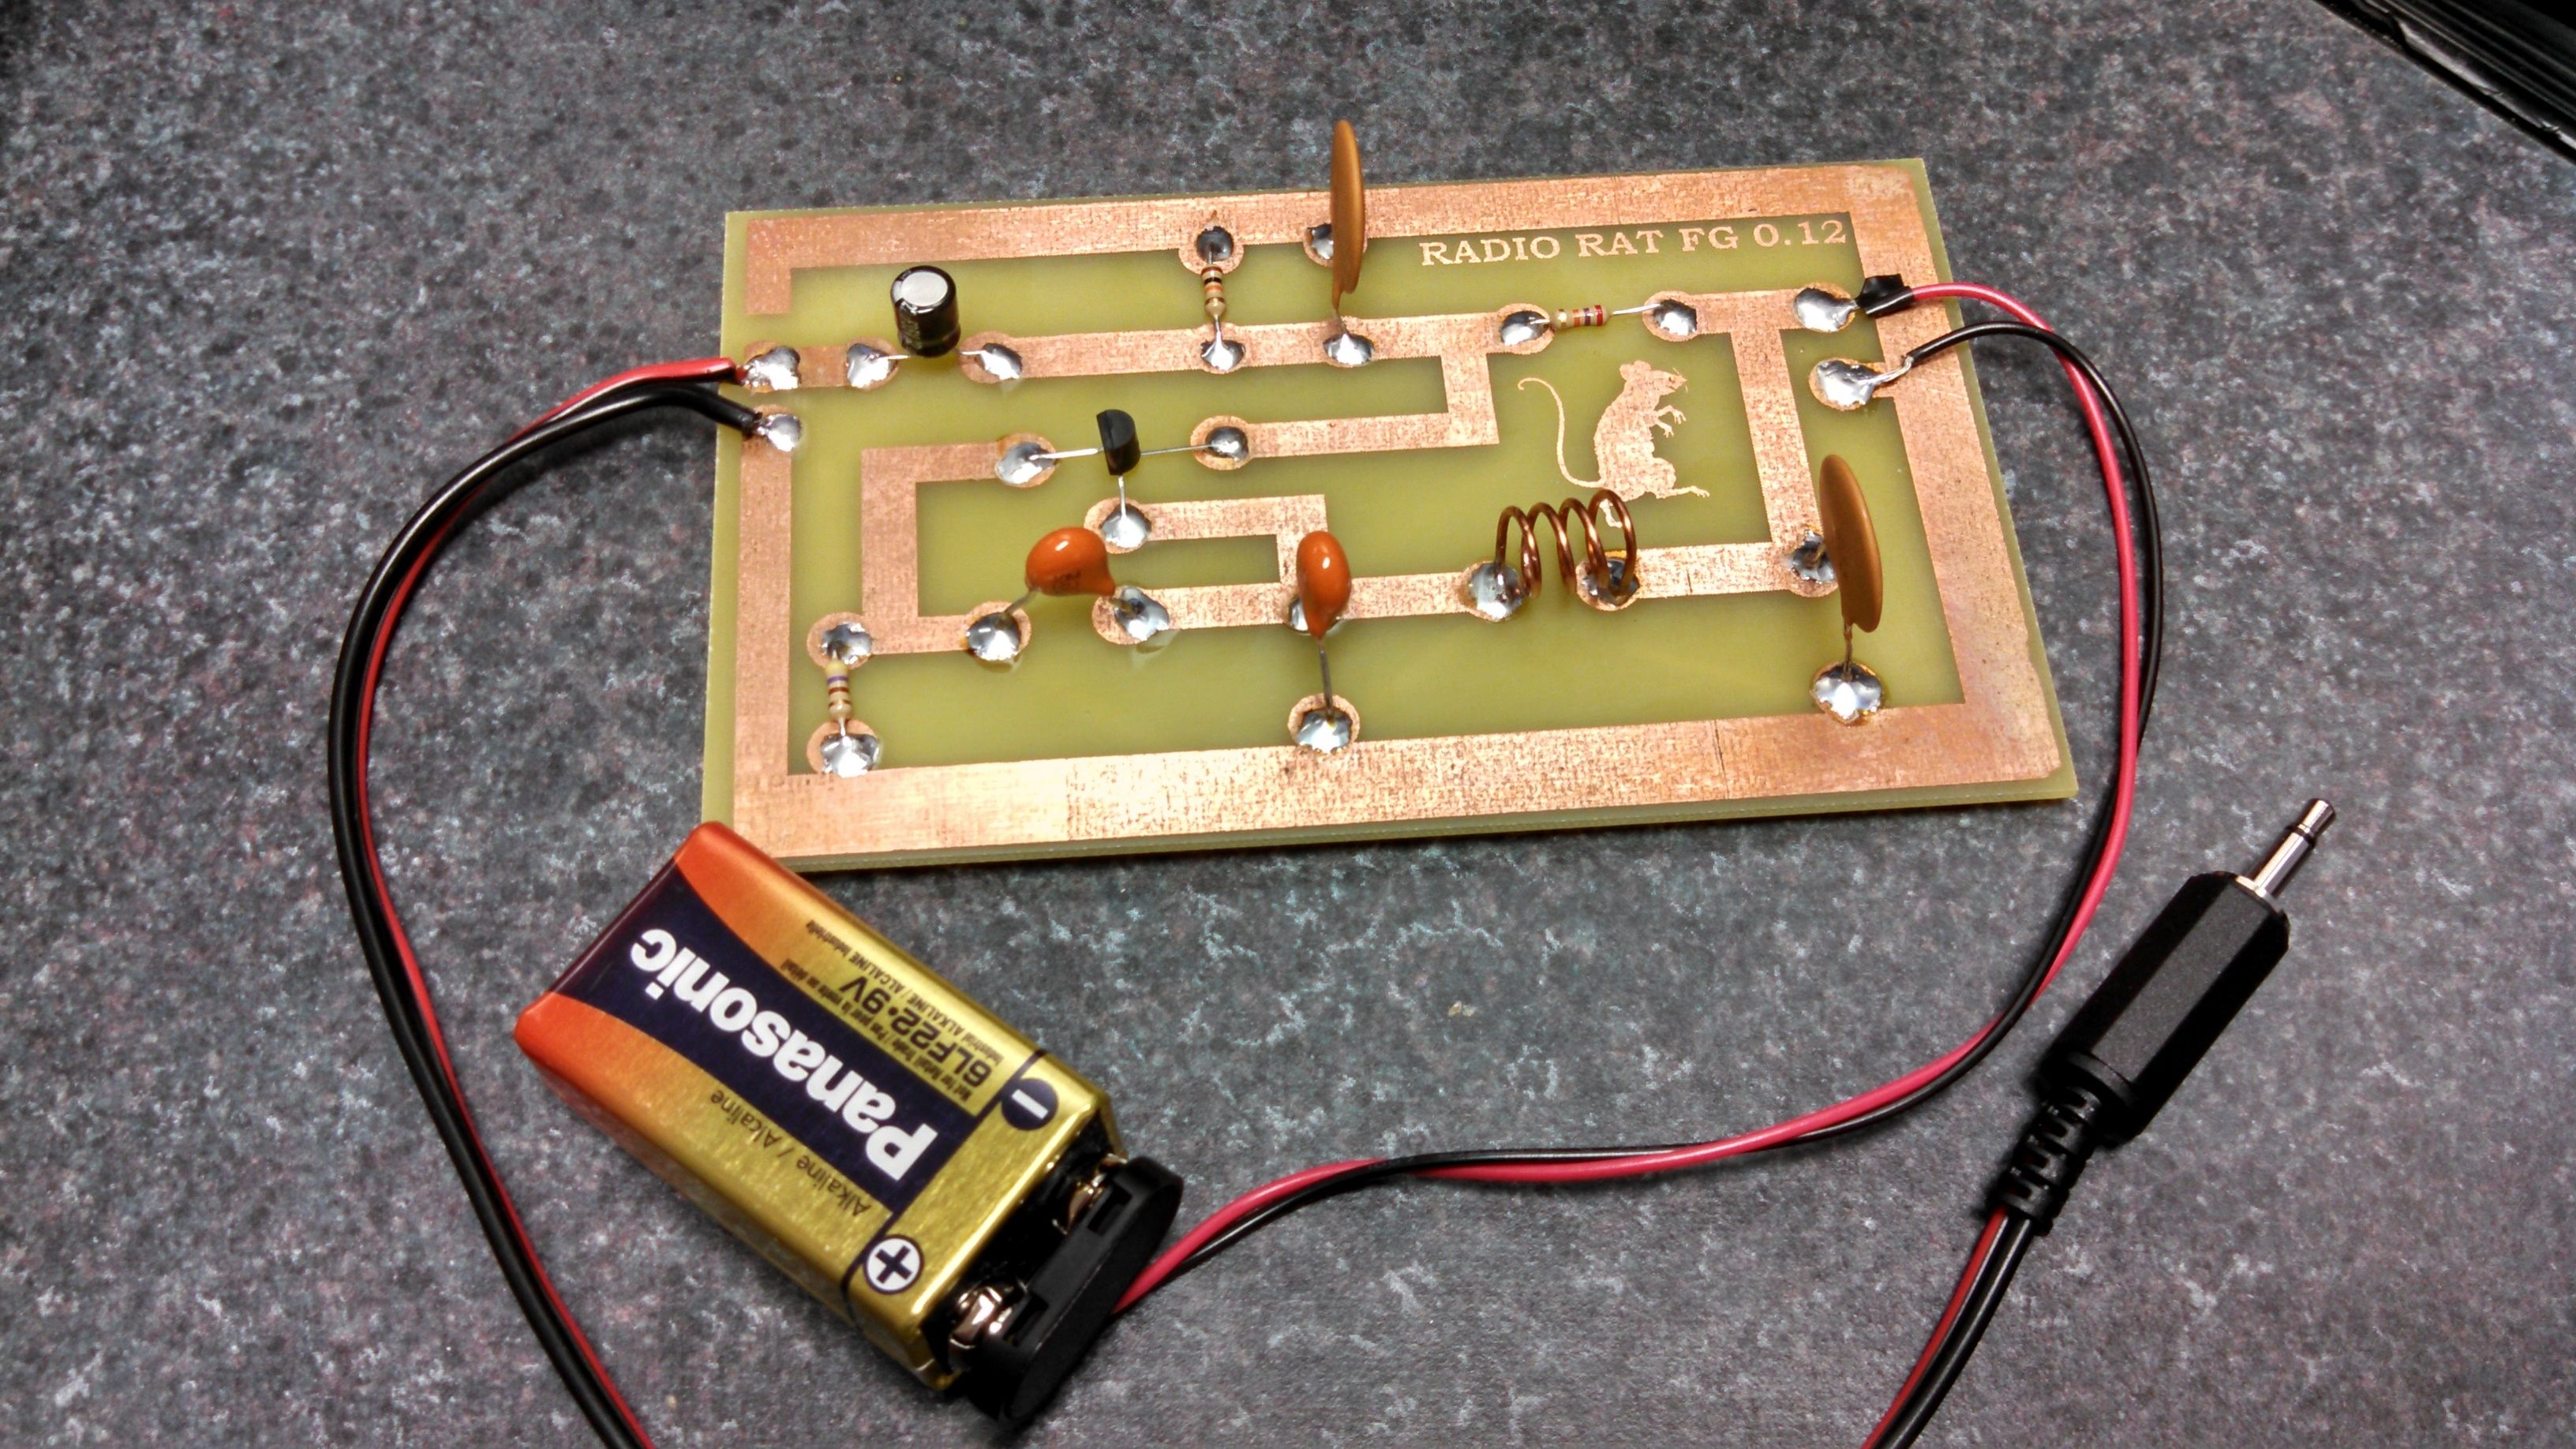 Super Simple iPod FM Transmitter Electronic circuit